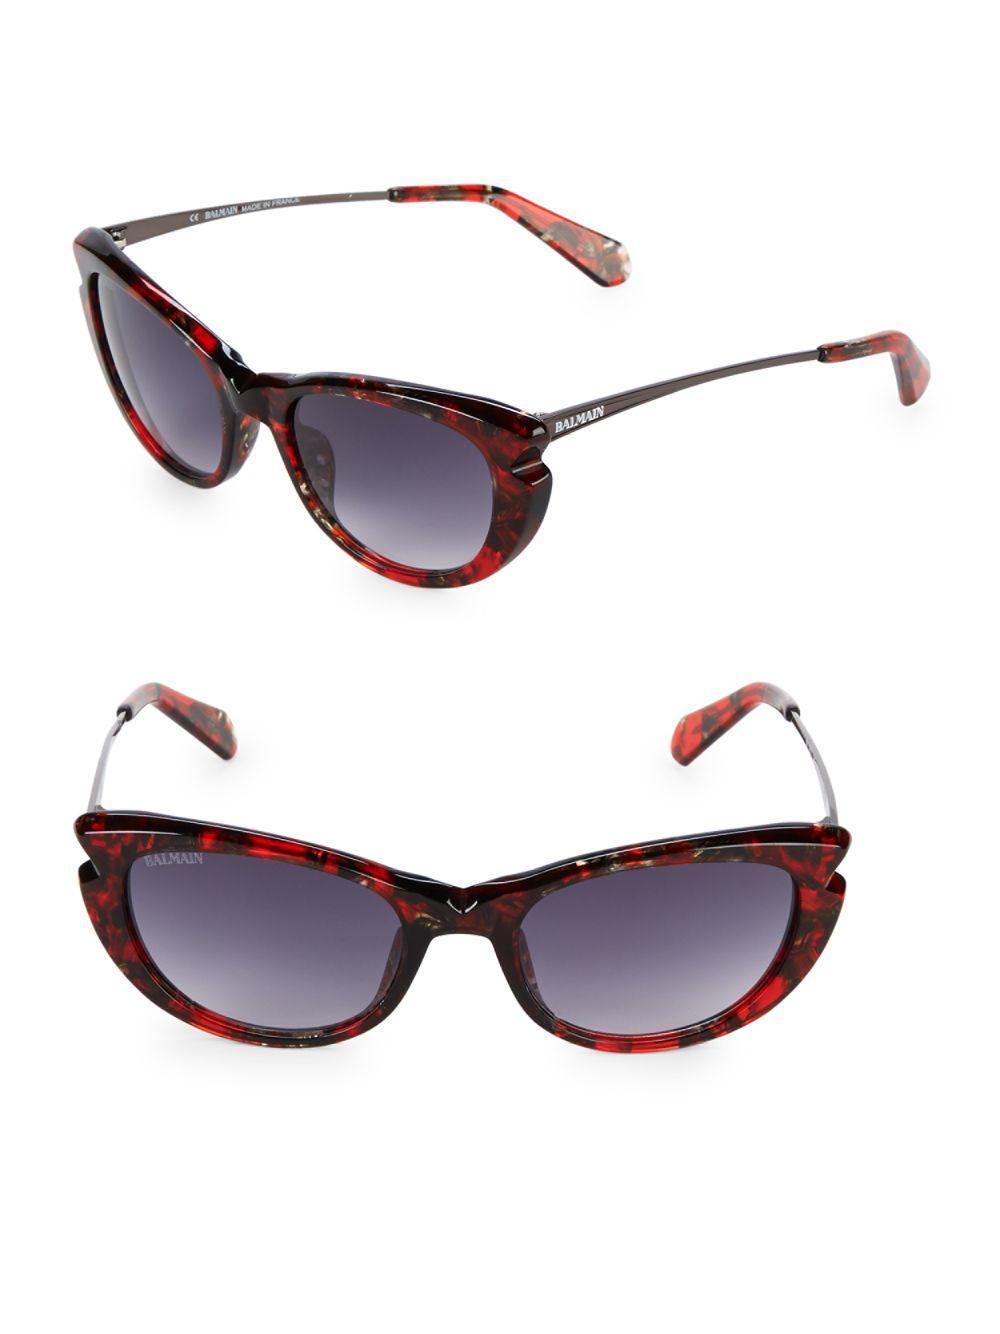 9ba0009c98f8 Lyst - Balmain 53mm Catyeye Sunglasses in Brown